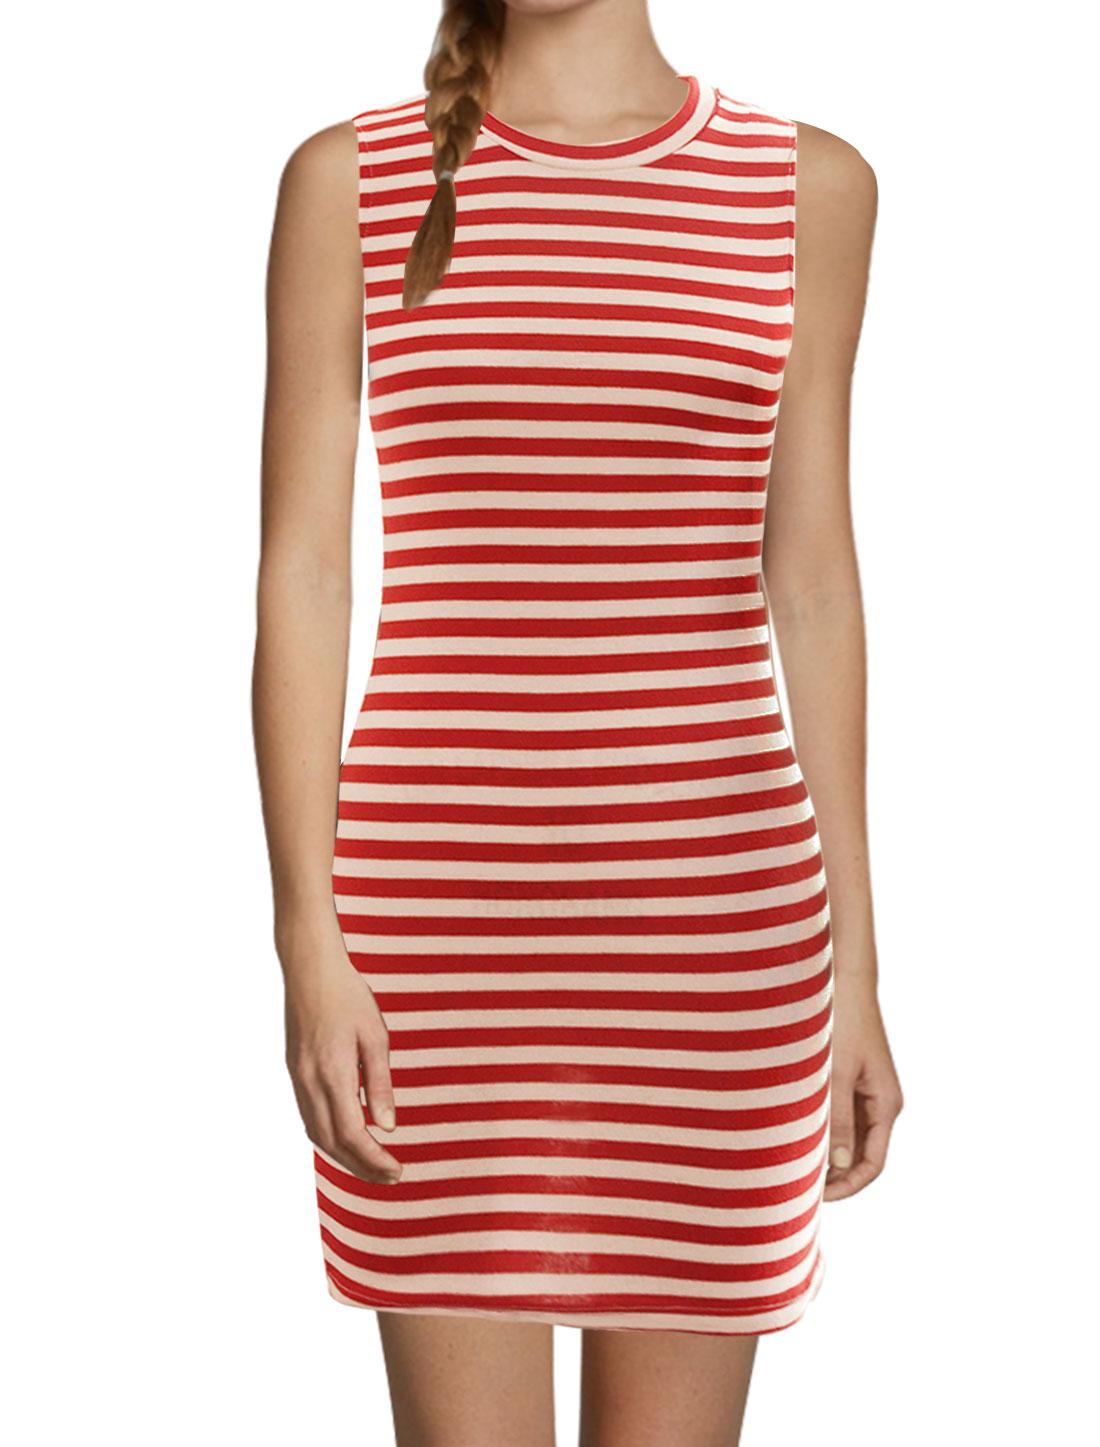 Women Stripes Crew Neck Sleeveless Unlined Bodycon Dress Red White M